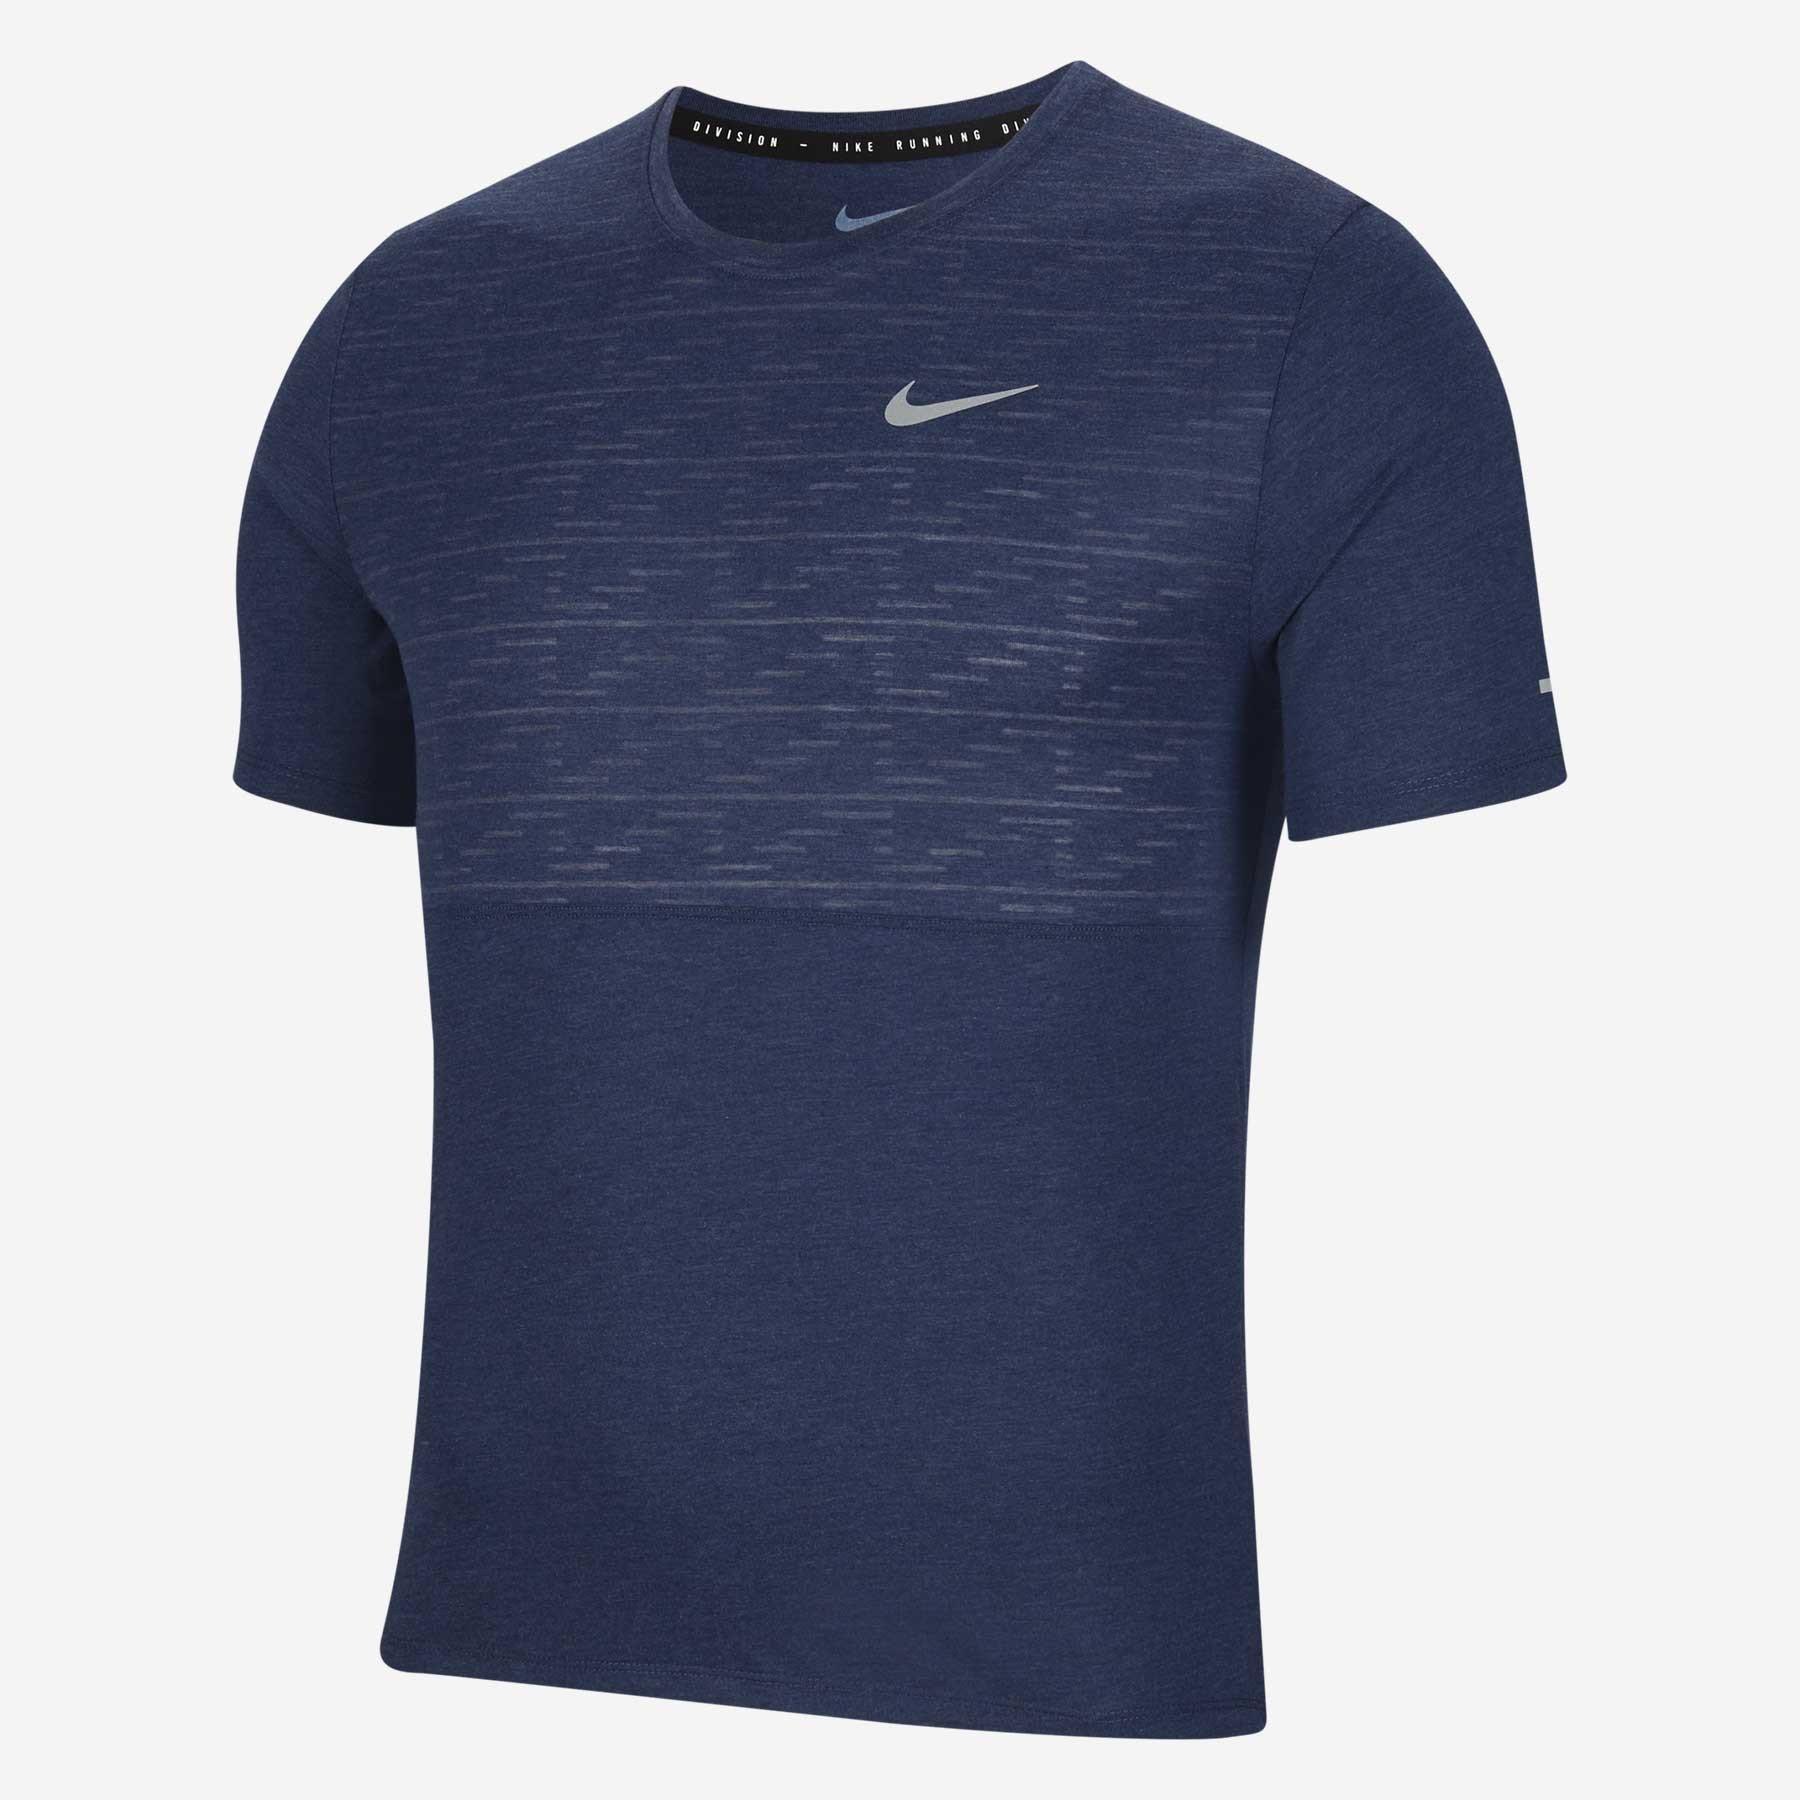 Camiseta Nike DRI FIT RUN Division Miler AZUL